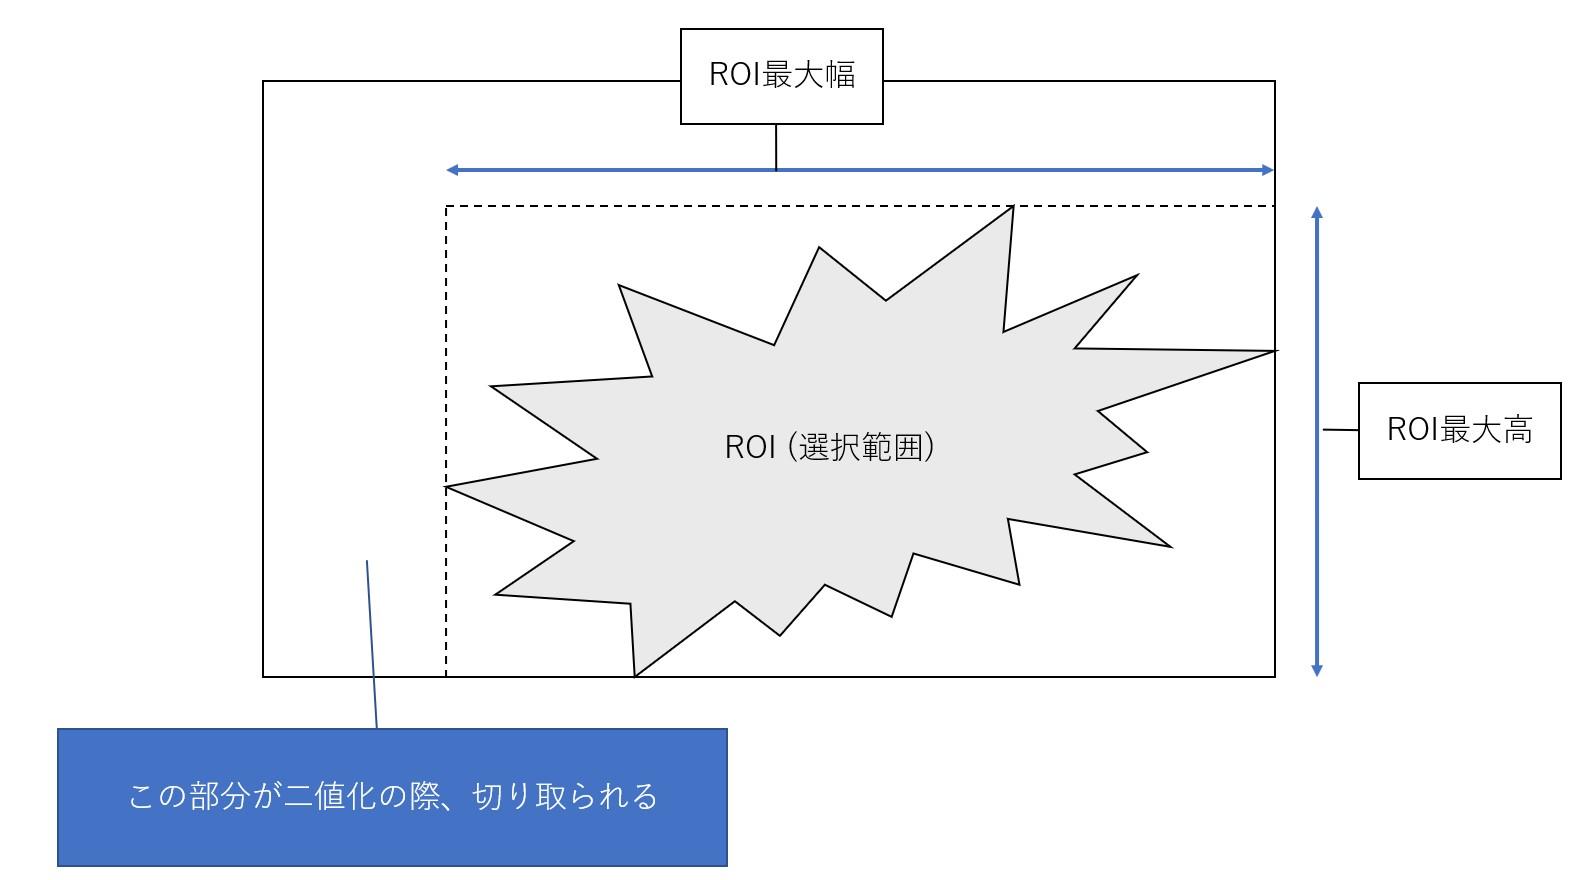 f:id:yasuo_ssi:20210412141848j:plain